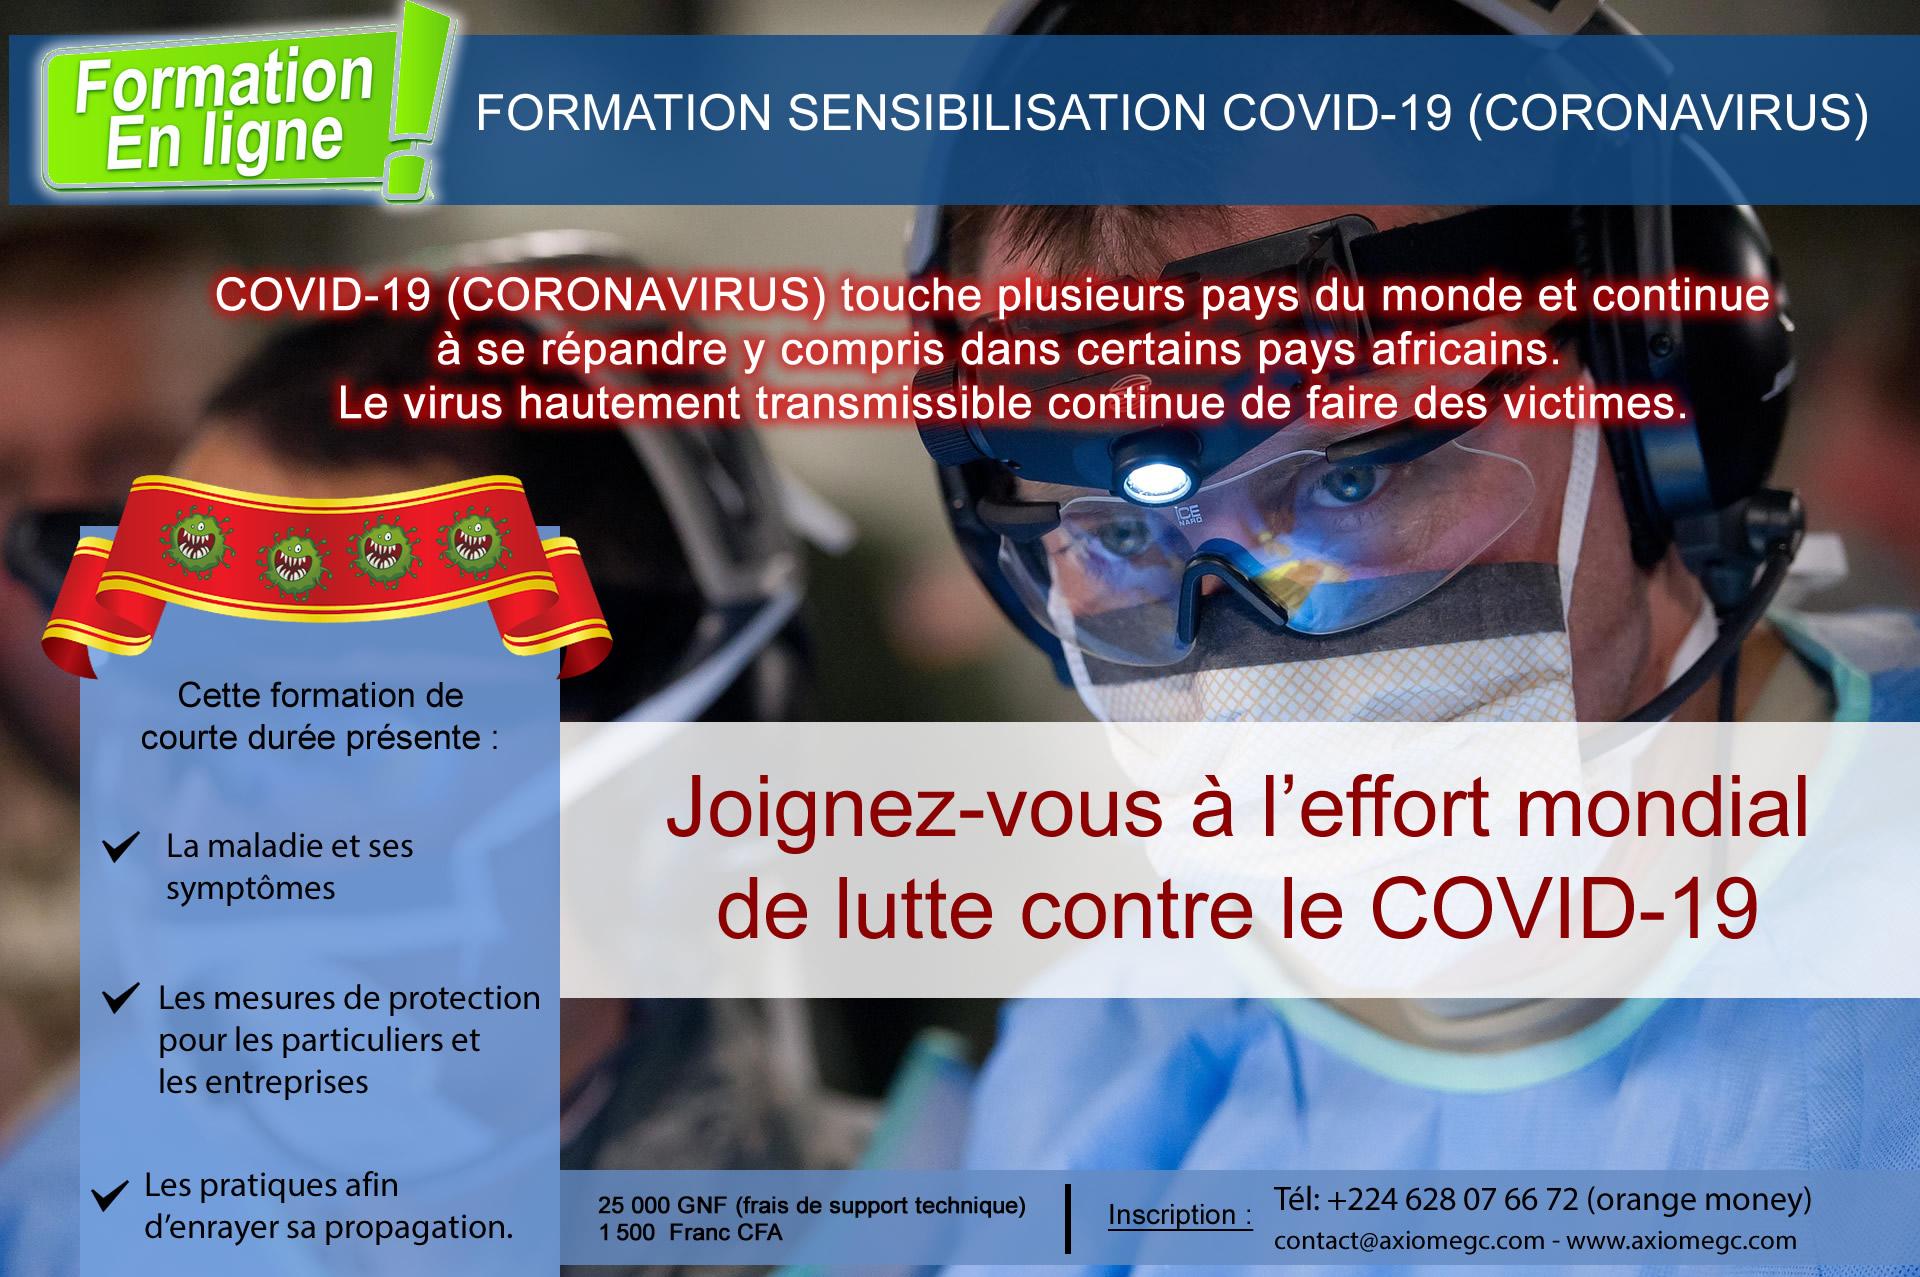 Formation COVID-19 (Coronavirus)